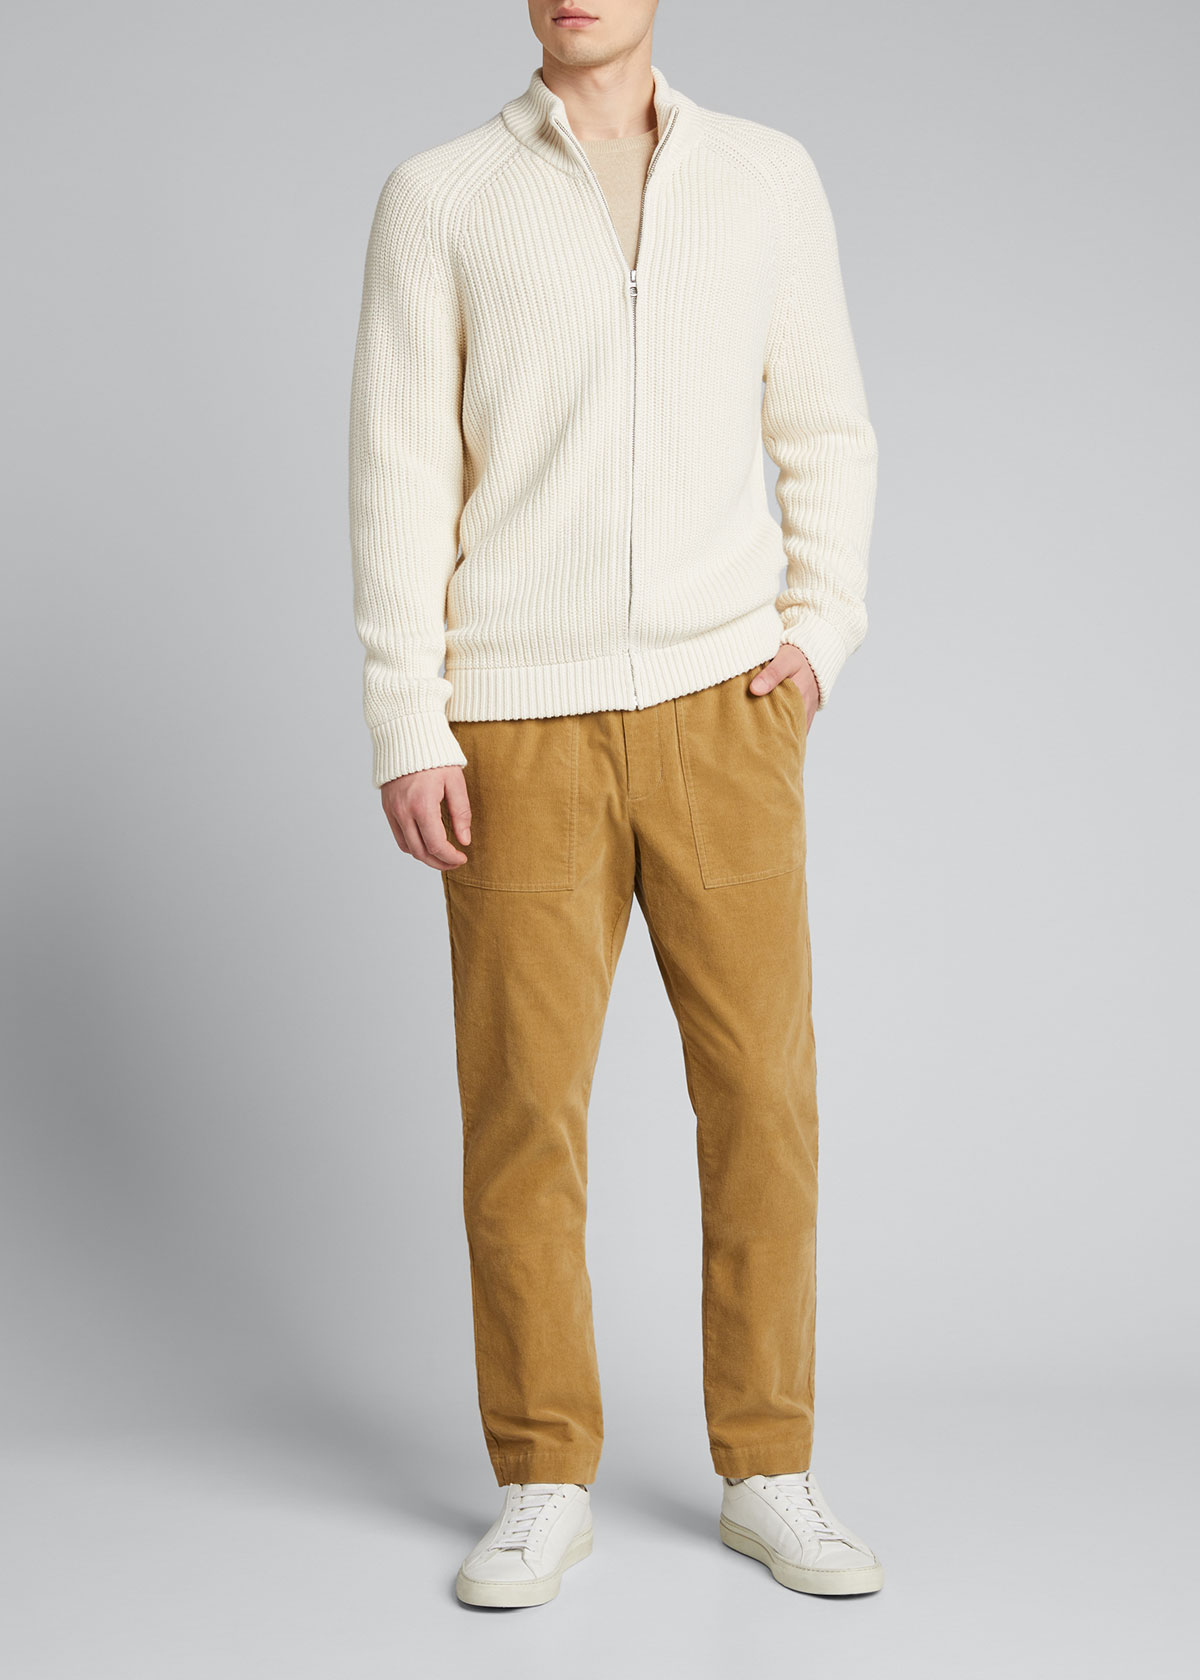 Vince Sweaters MEN'S RIBBED RAGLAN FULL-ZIP SWEATER